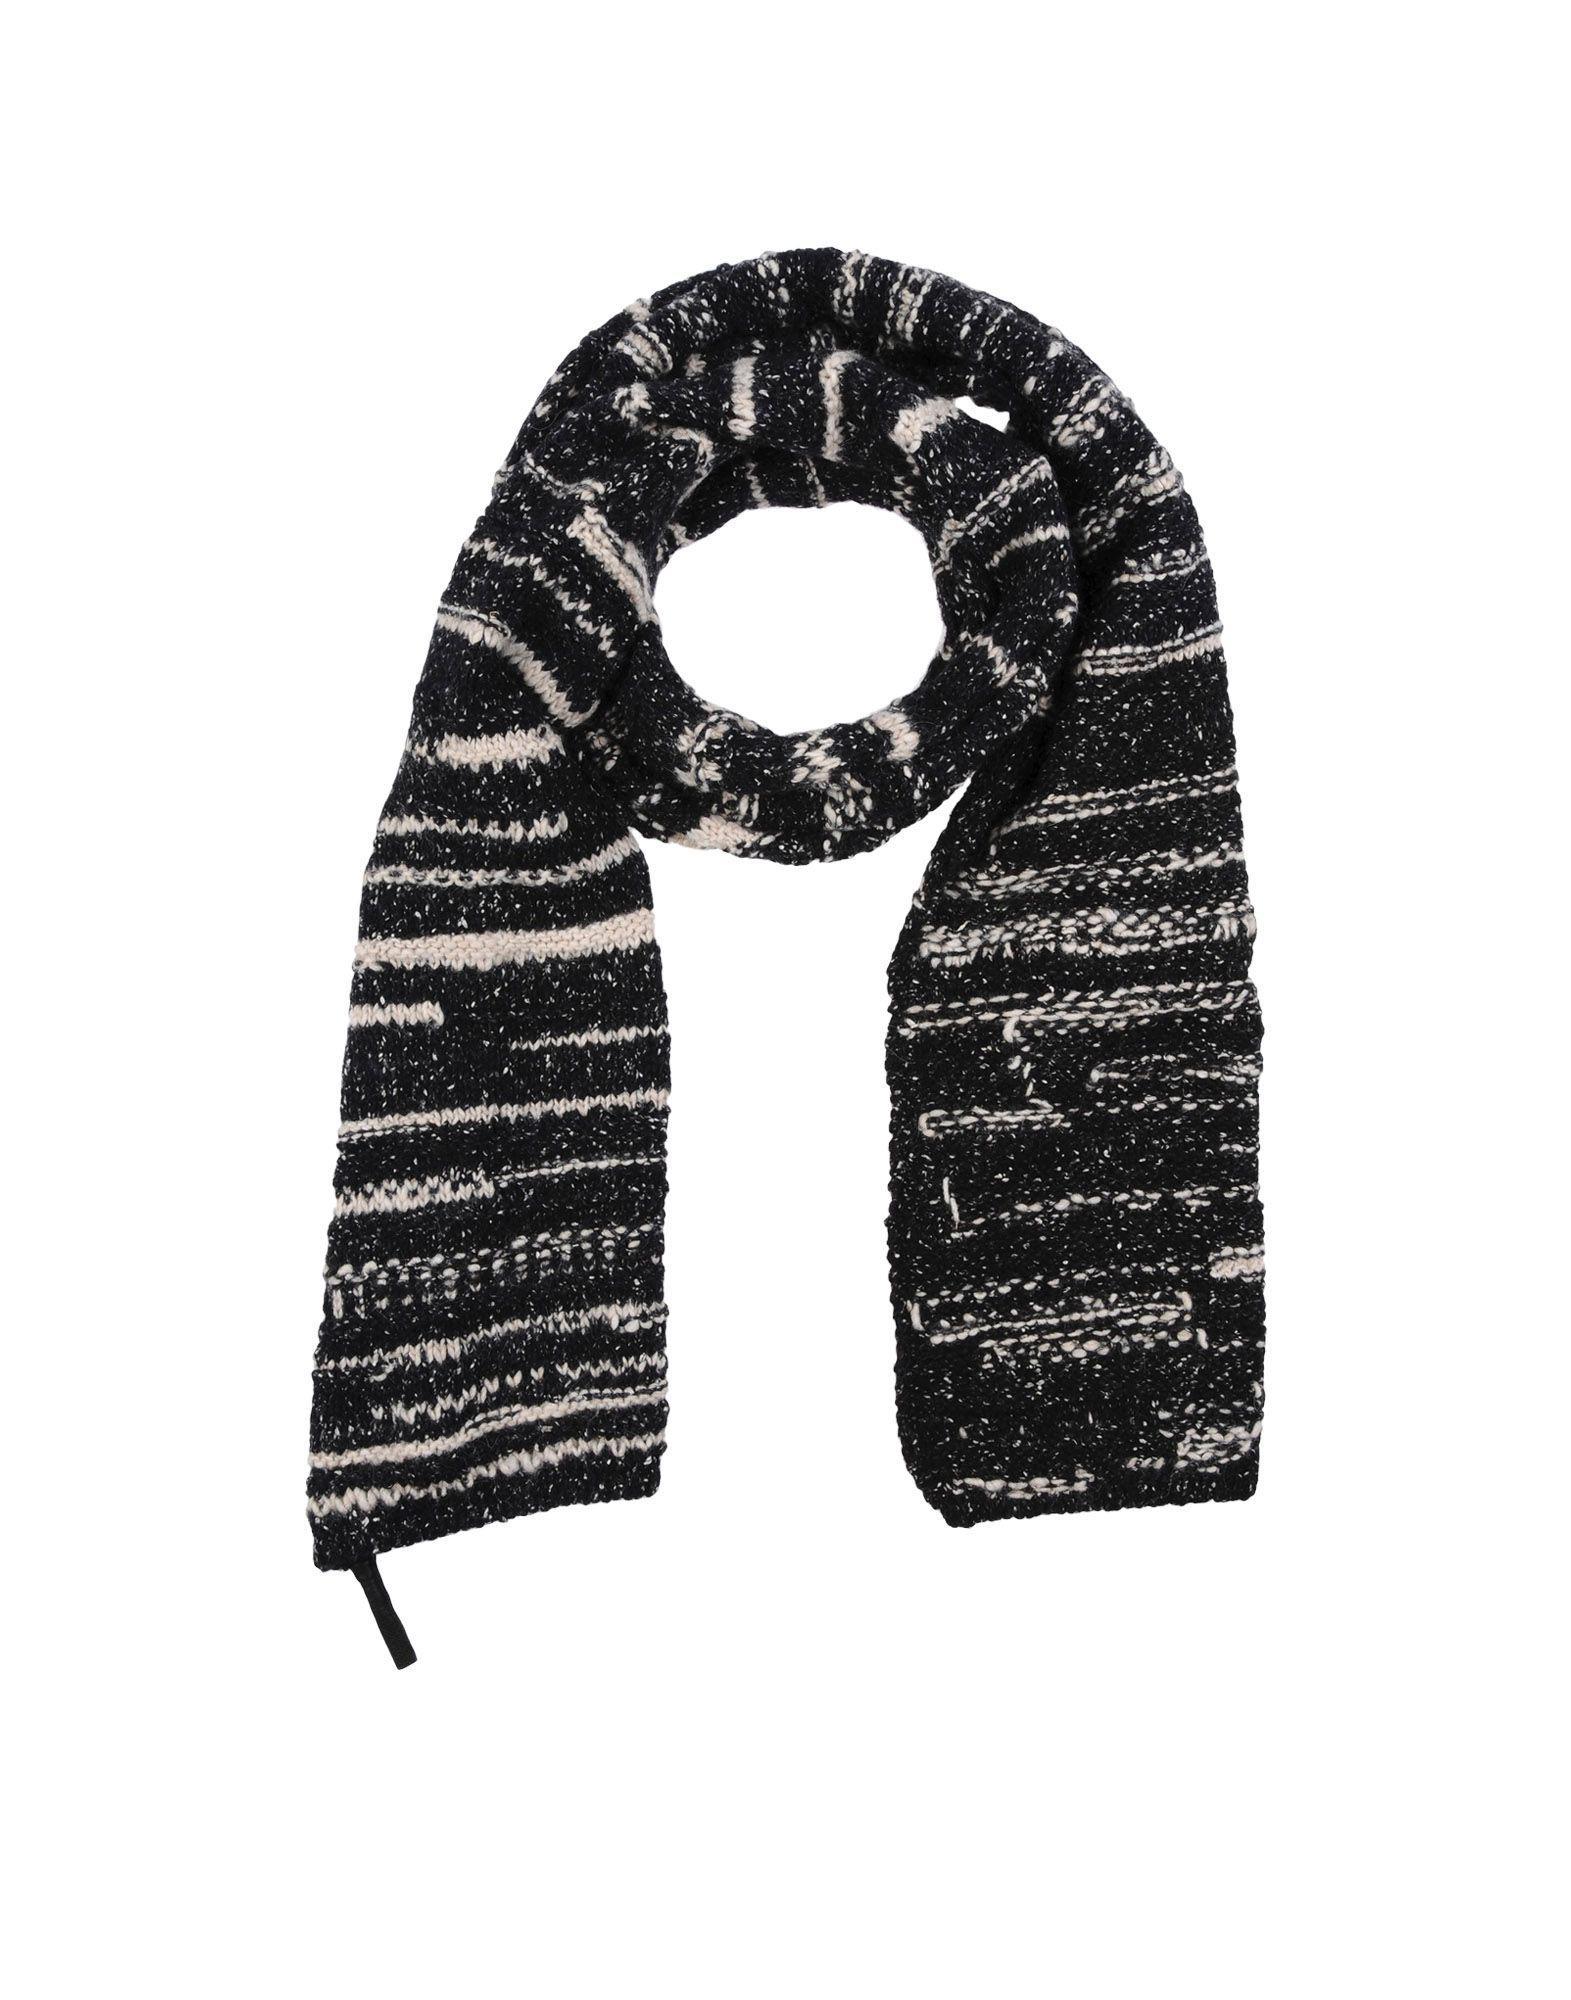 ACCESSORIES - Oblong scarves Loma lBfzCgl